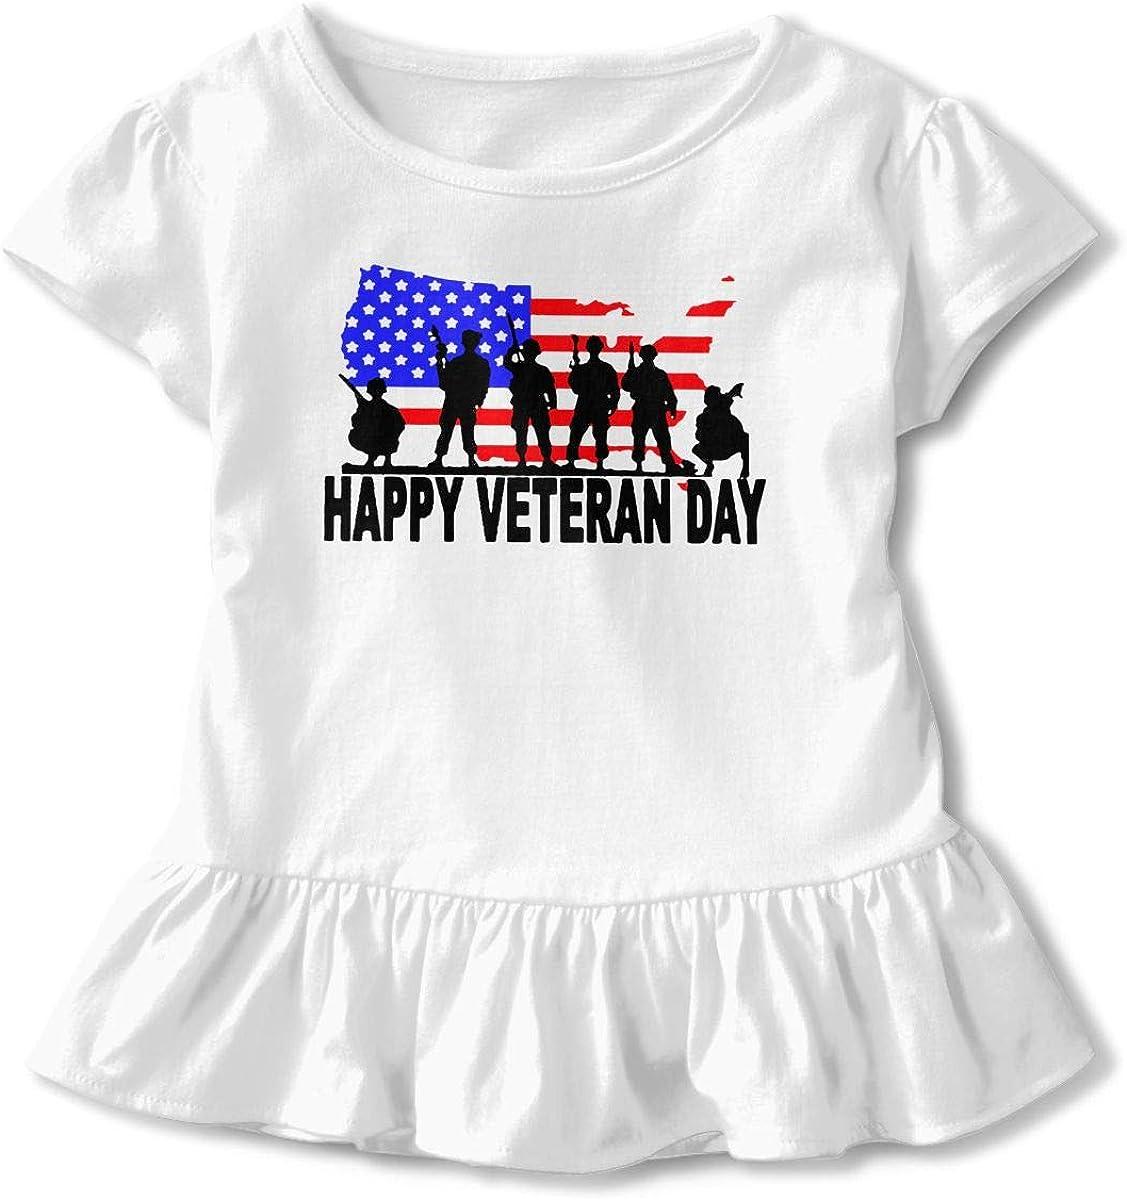 Veterans Day Kids Children Round Collar T-Shirt Help Shirt